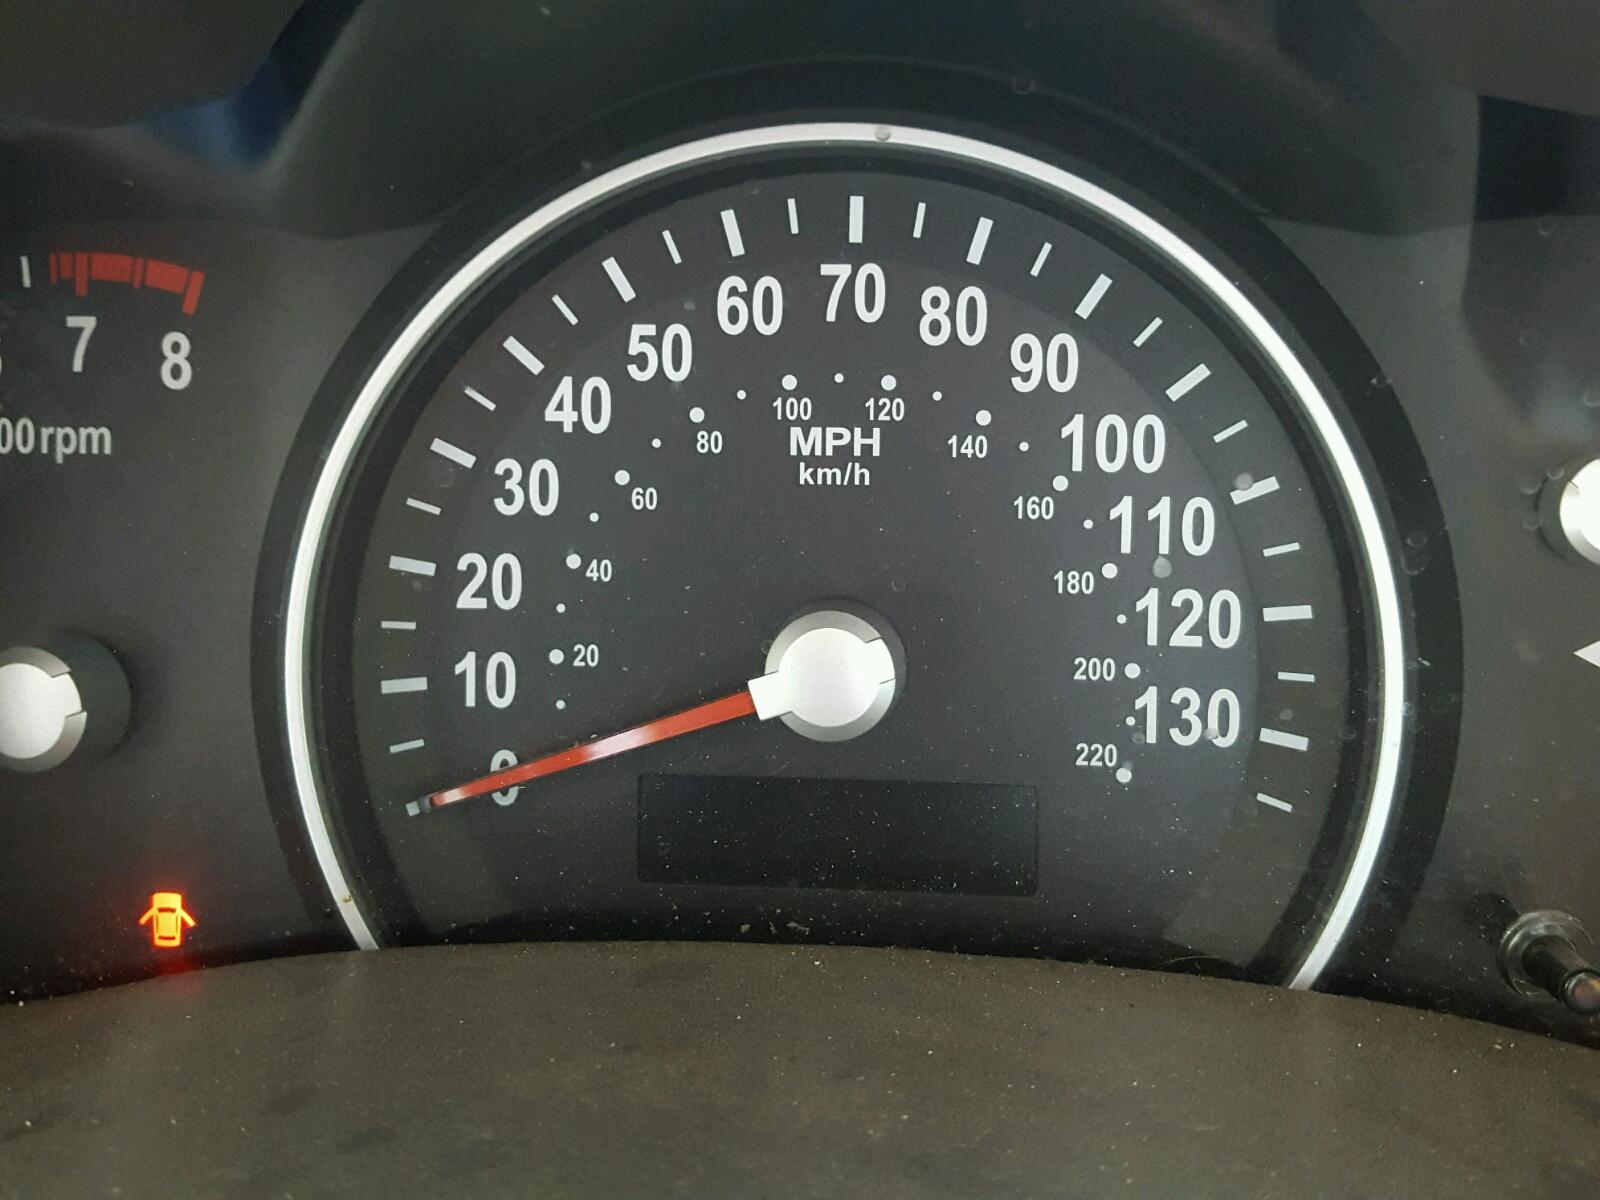 2011 Kia Sedona Lx For Sale At Copart Haslet Tx Lot 45932118 Gauges